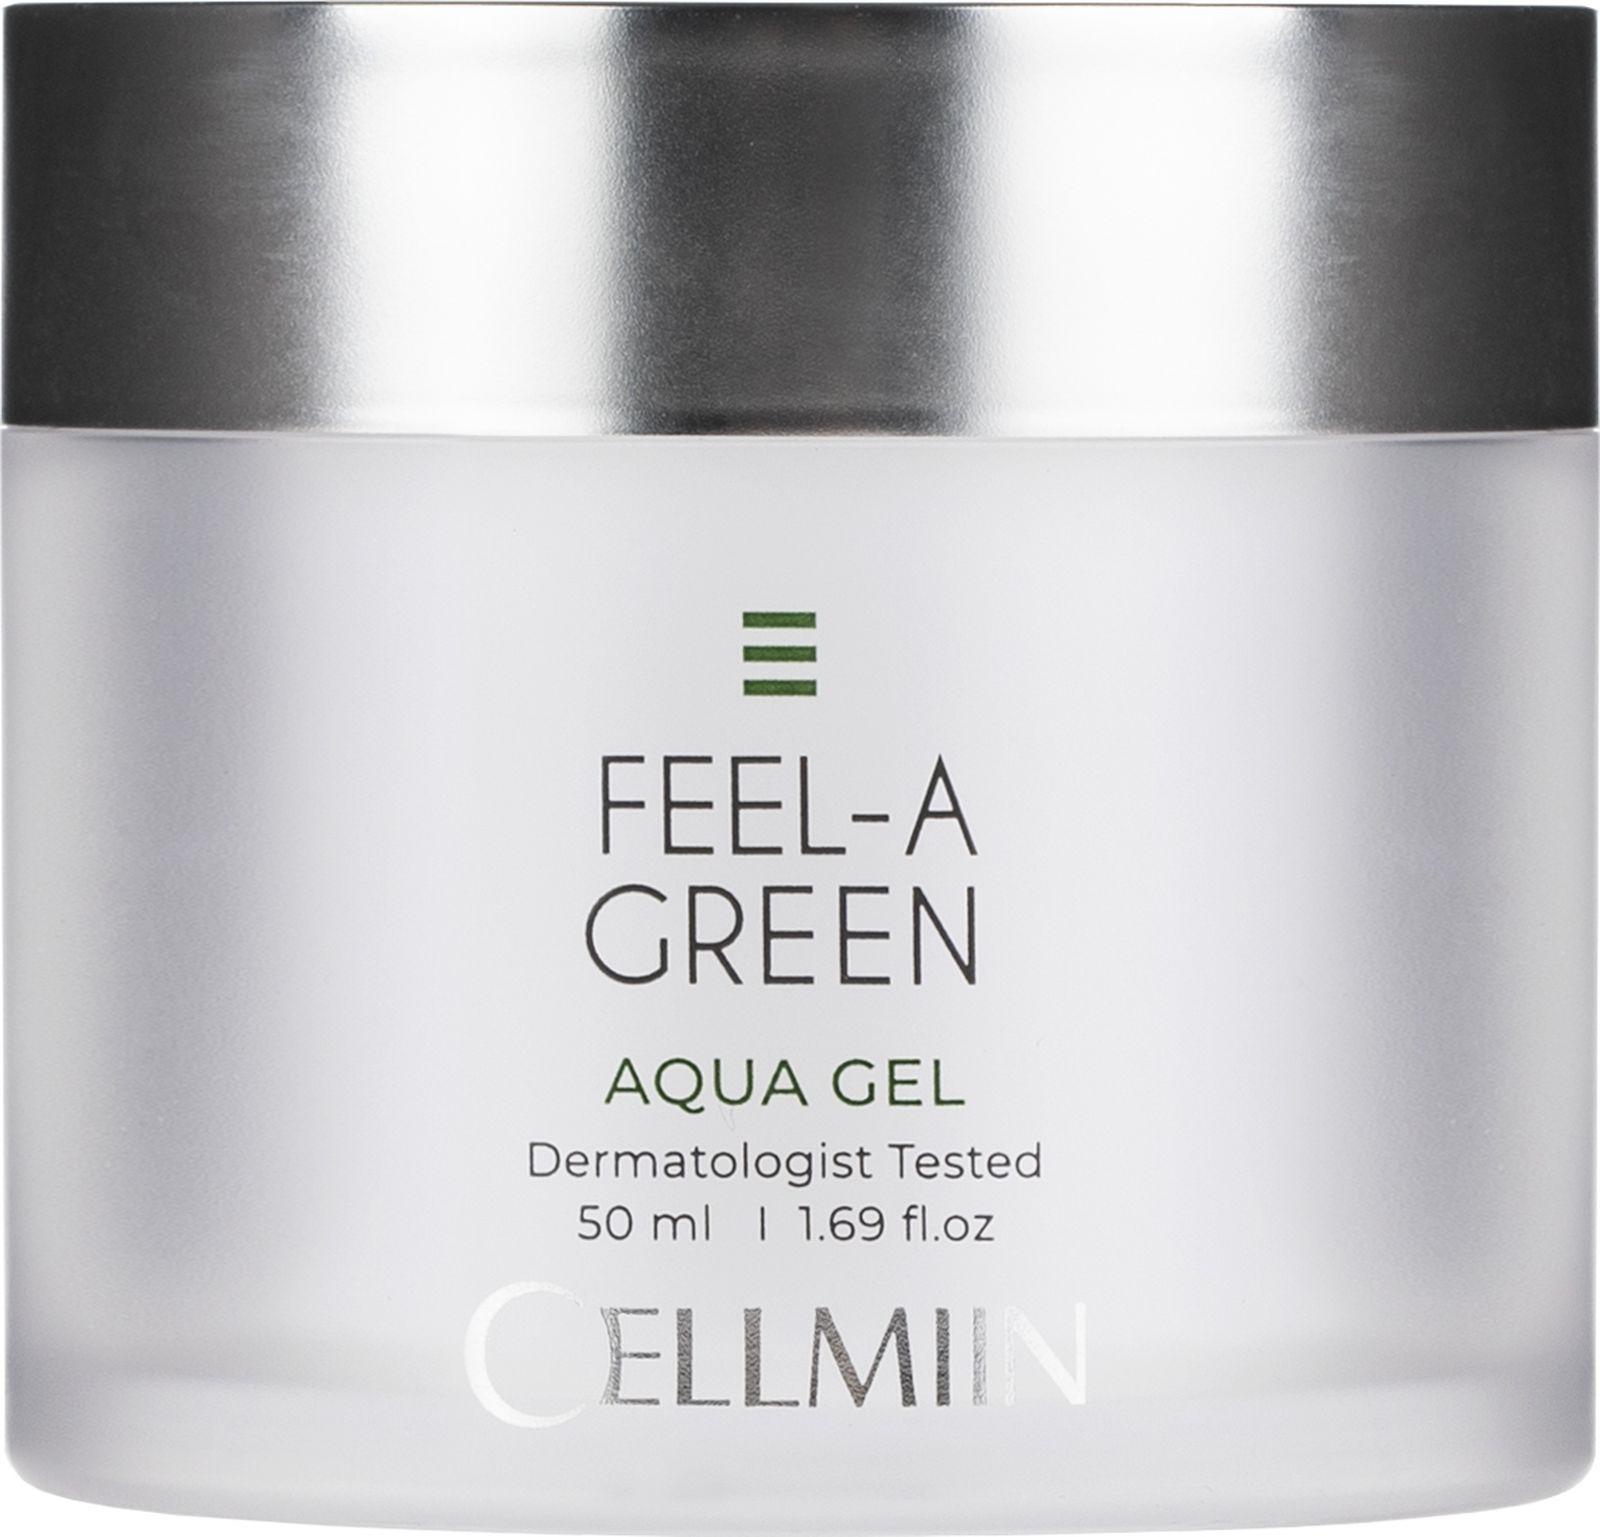 Аква-гель для лица Cellmiin Feel-A-Green Aqua Gel, 50 мл Продукт прошел тест на гипоаллергенность.. Аква гель для лица...